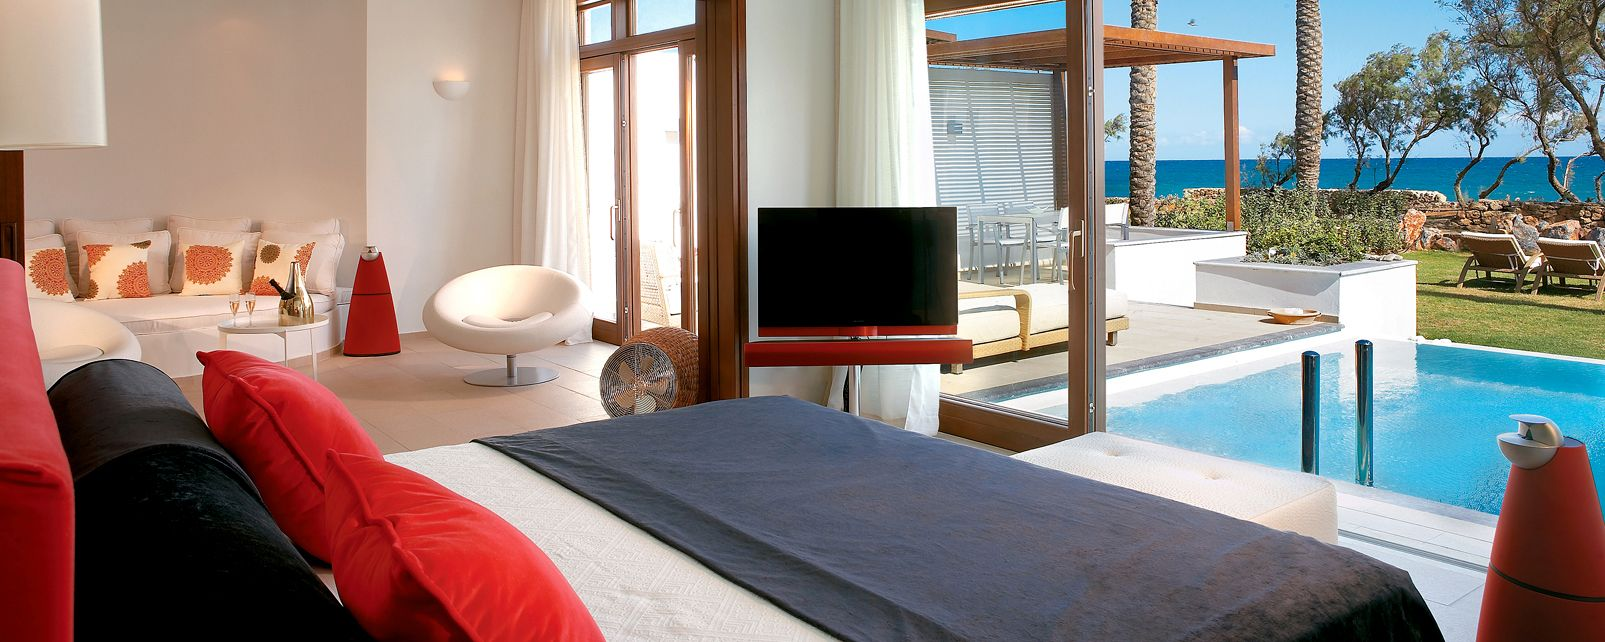 Hotel Grecotel Amirandes